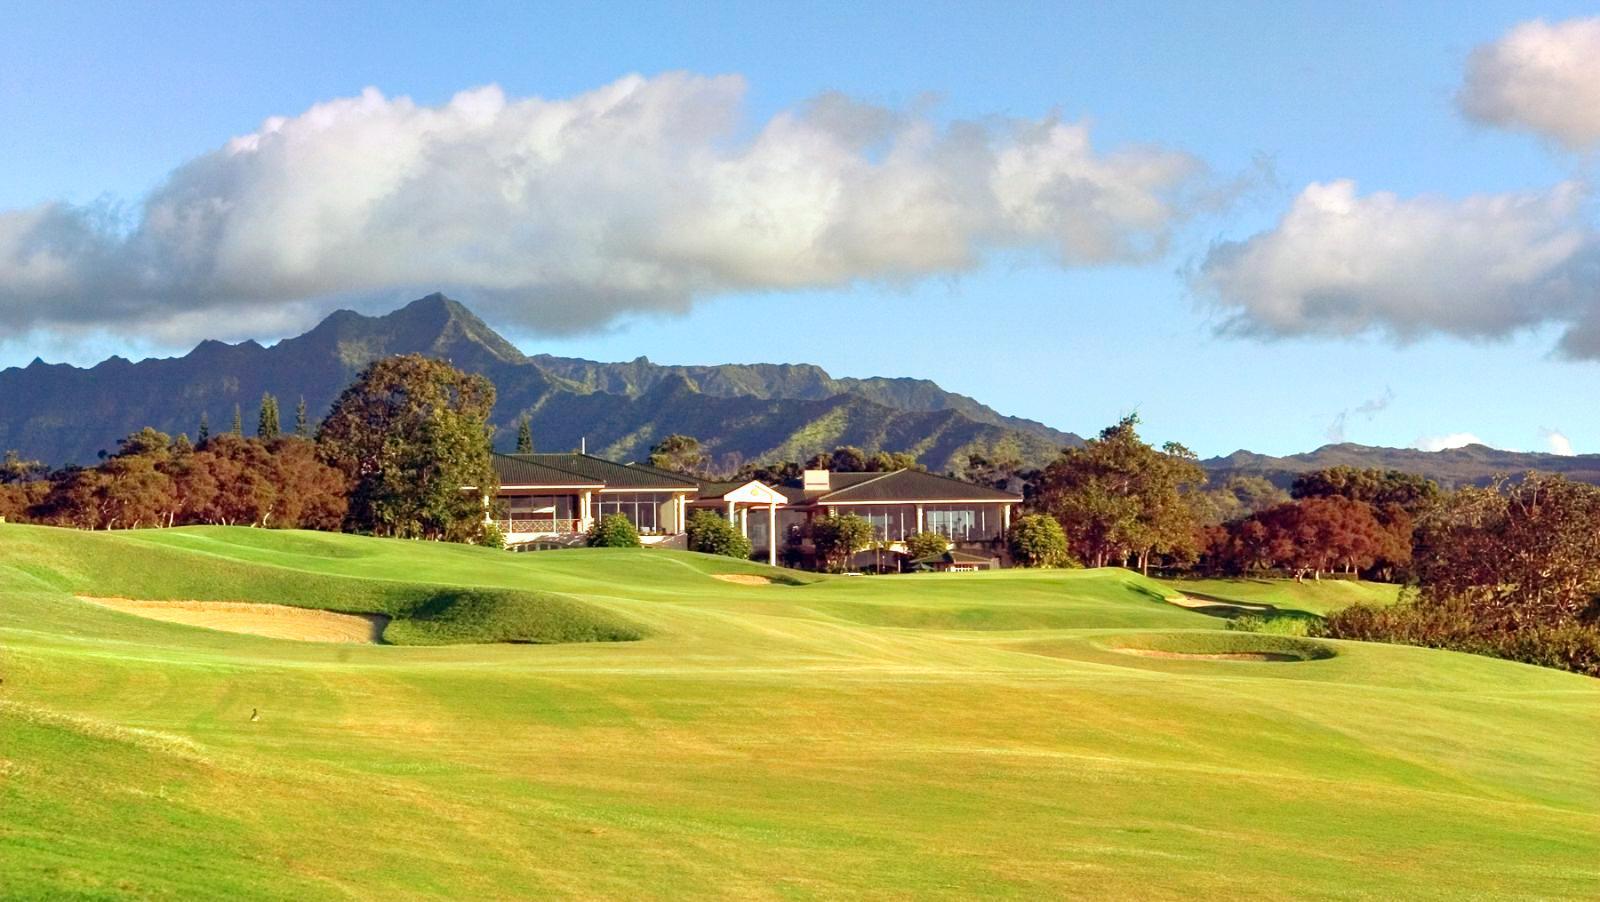 Kauai Golf Club - Prince Course